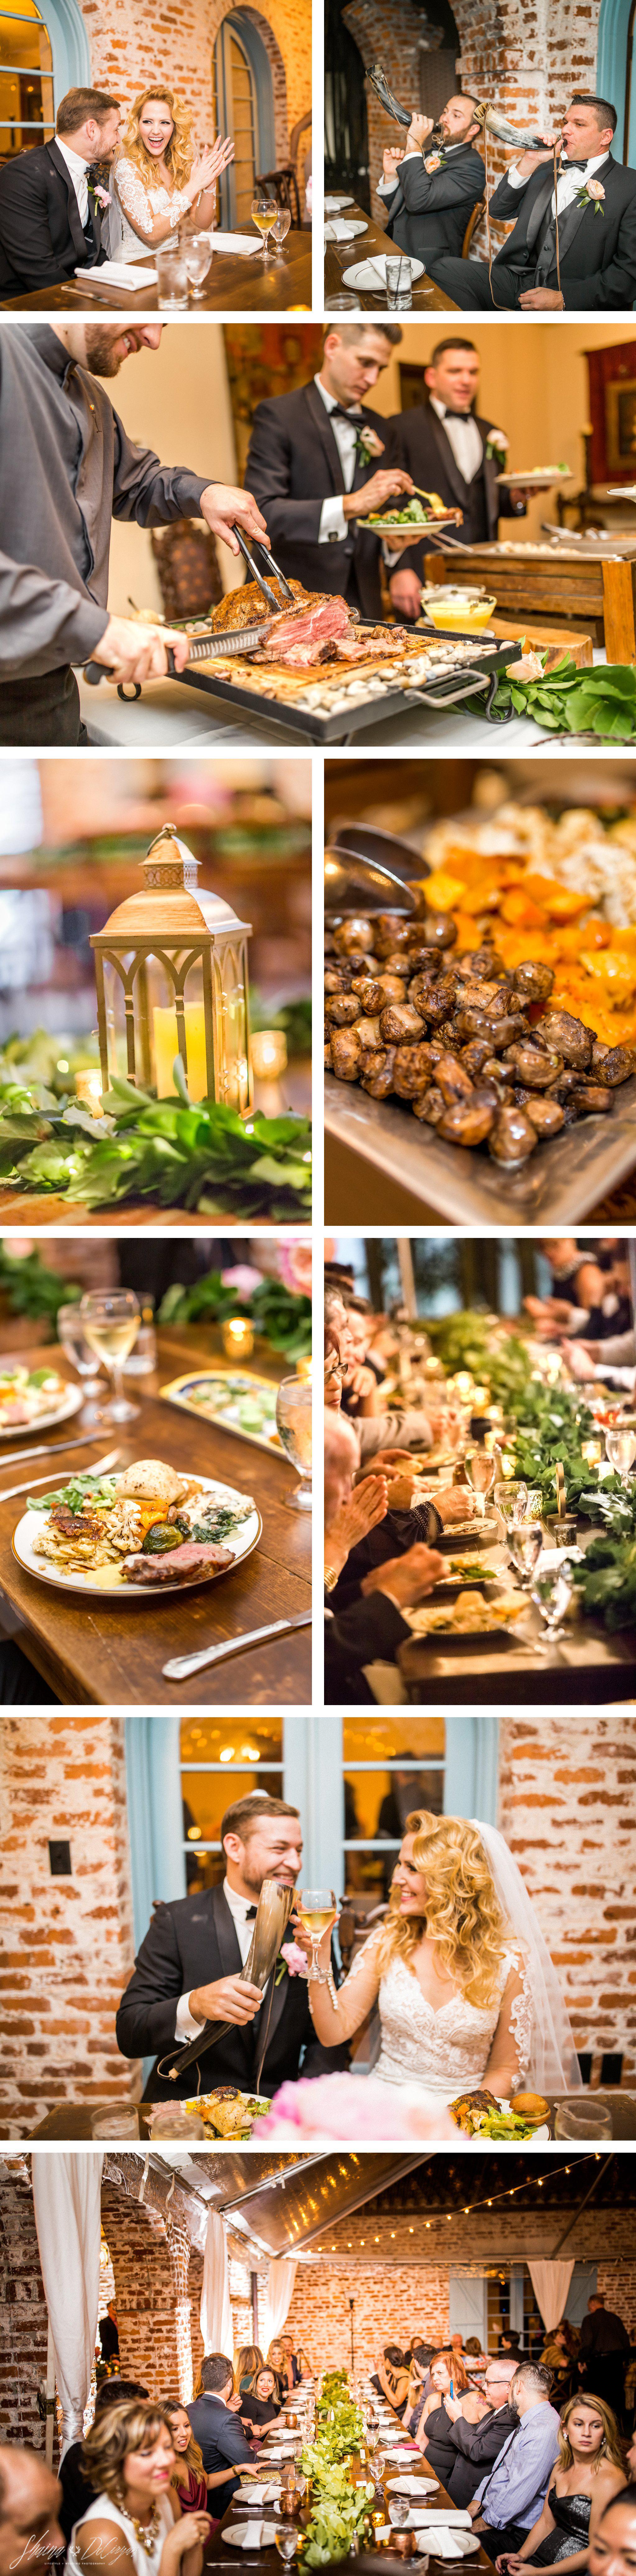 Incredible Reception food by Arthur's Catering at a Retro Hollywood Glam Casa Feliz Wedding